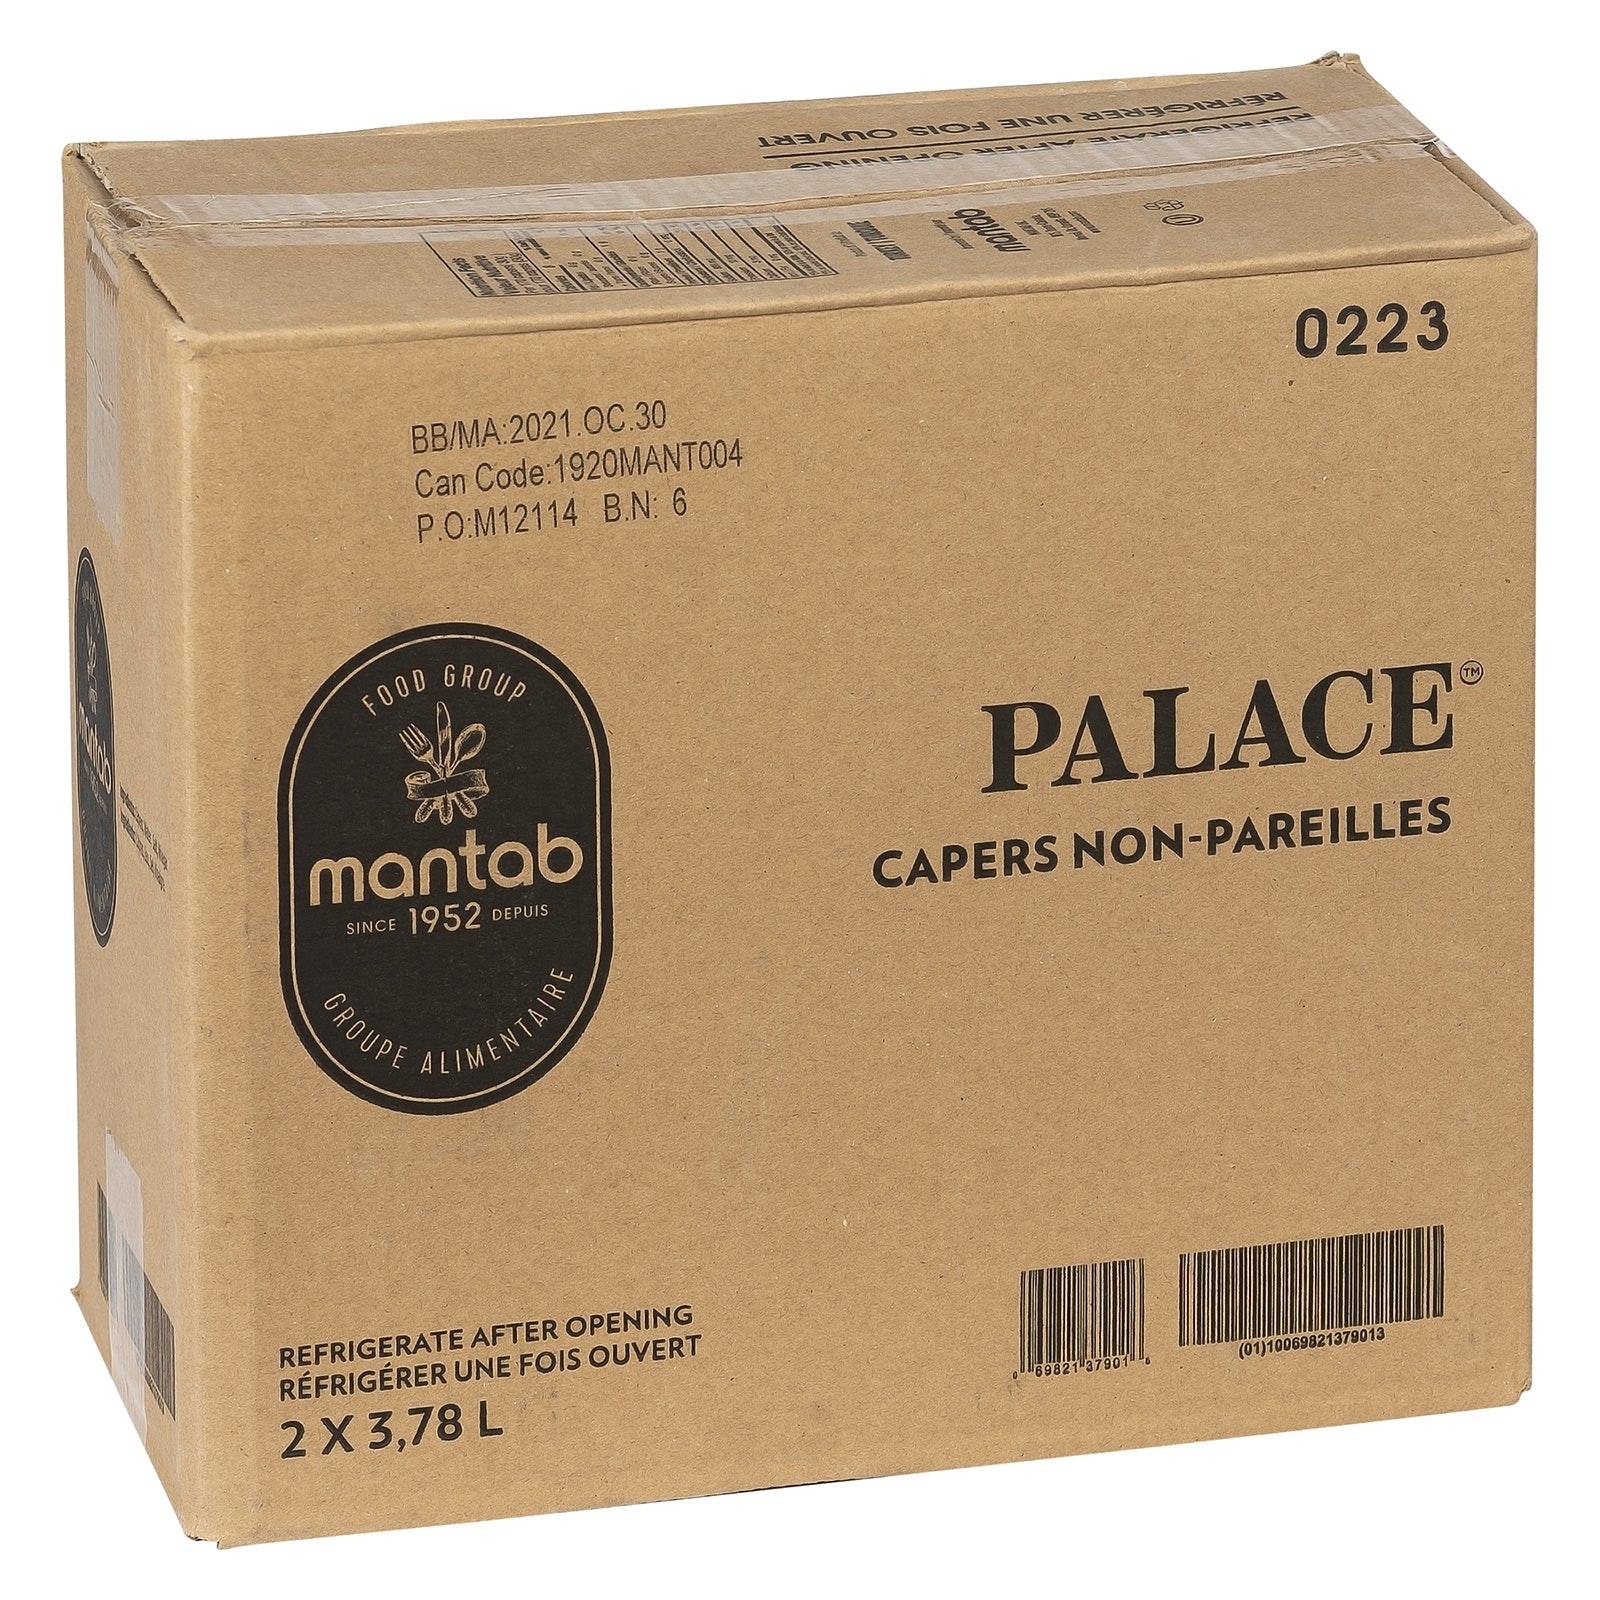 PALACE Capers non-Pareille